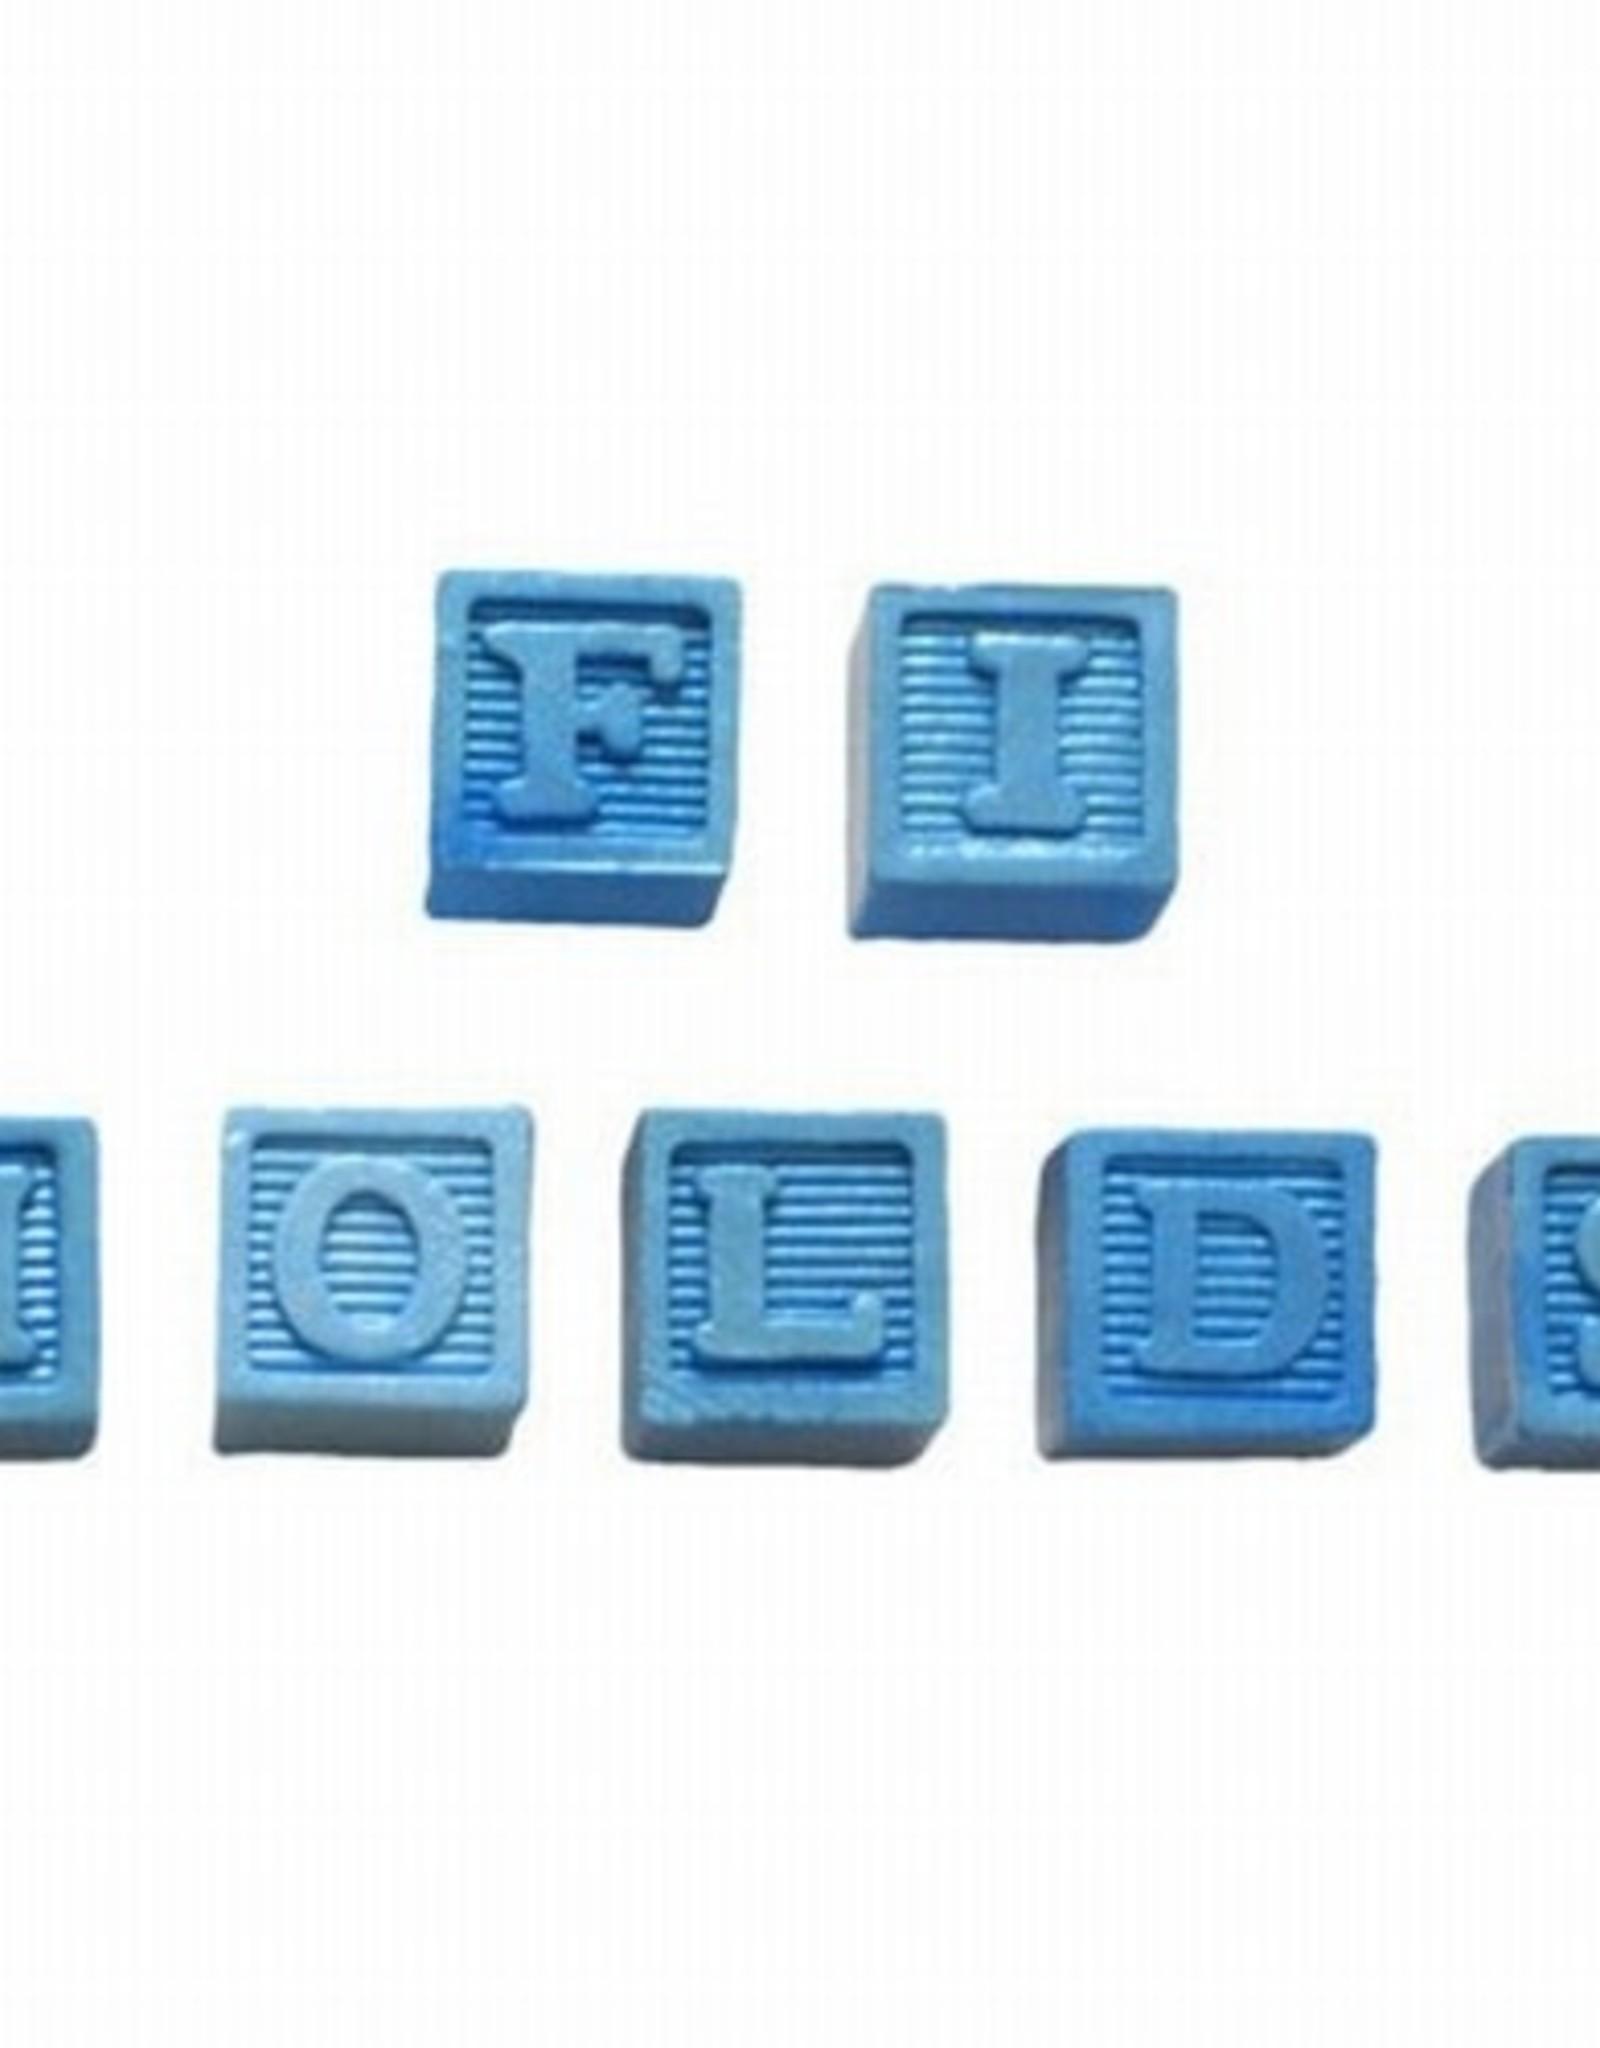 First Impressions Molds First Impressions Molds Alphabet Blocks